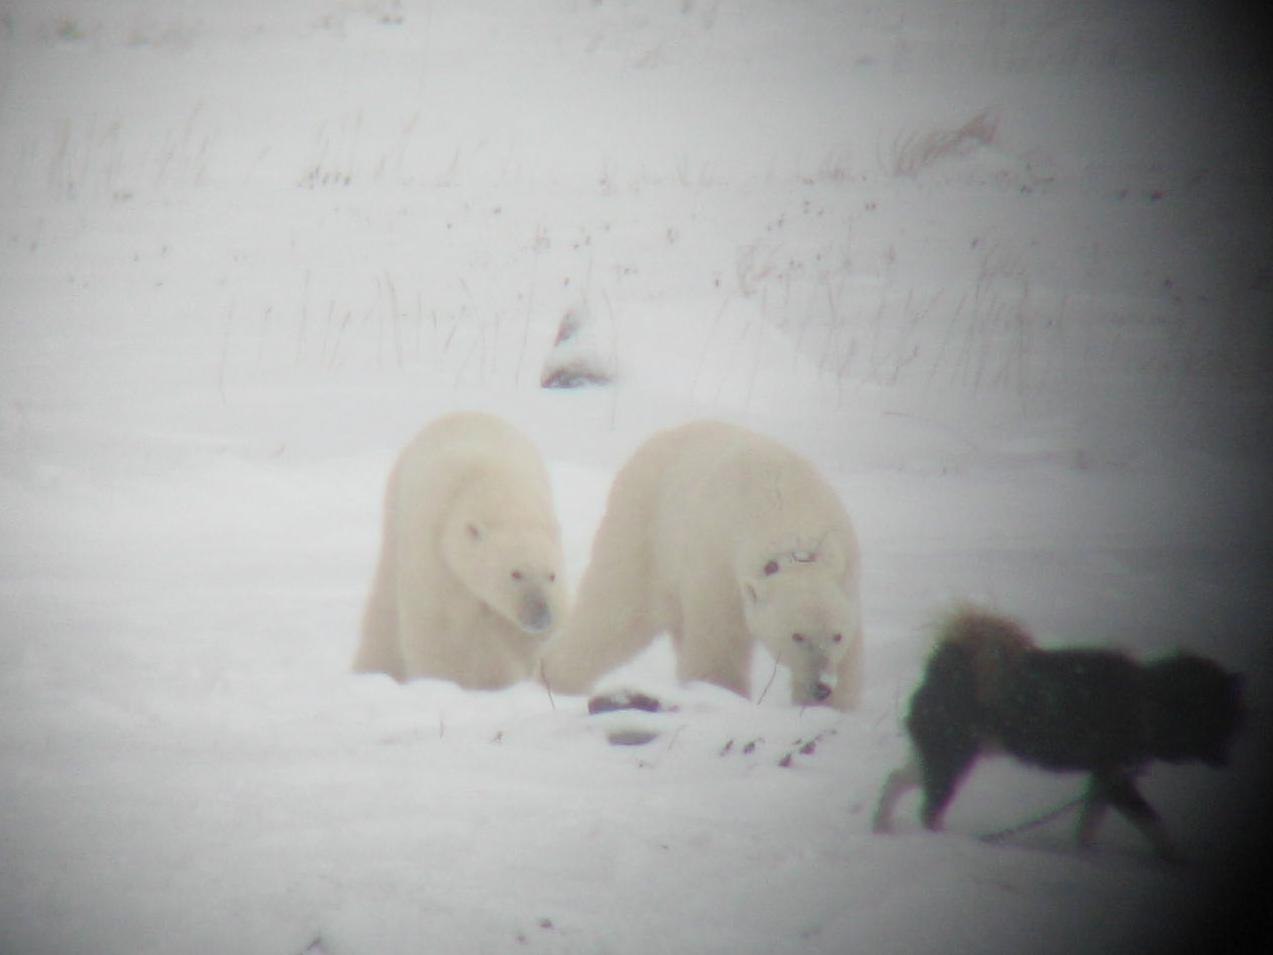 Good friends. Polar bears and dog at play